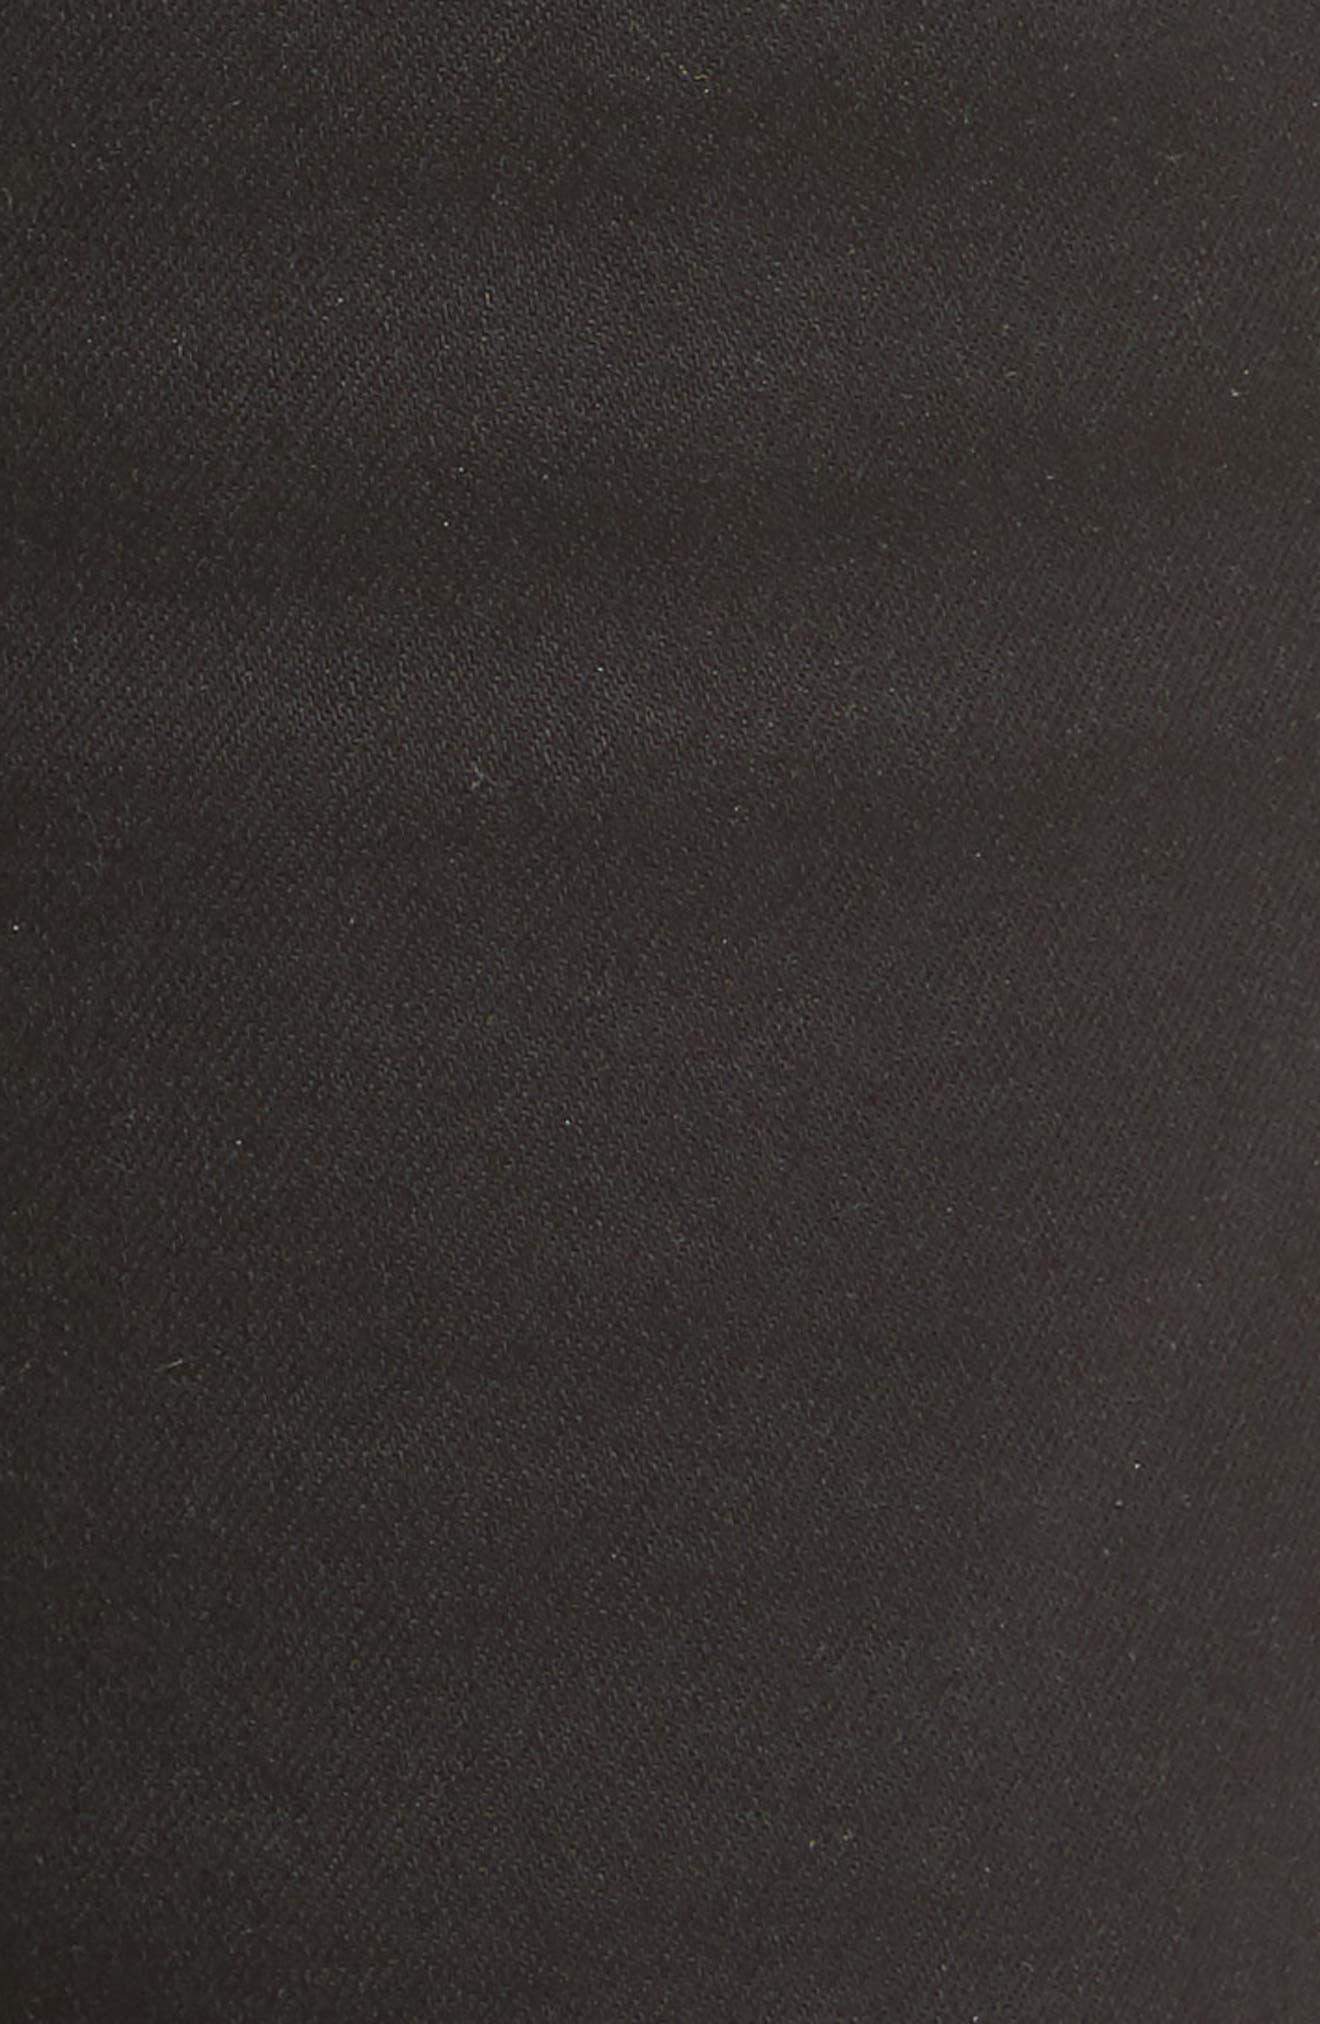 Natalie Stretch Bootleg Jeans,                             Alternate thumbnail 5, color,                             002